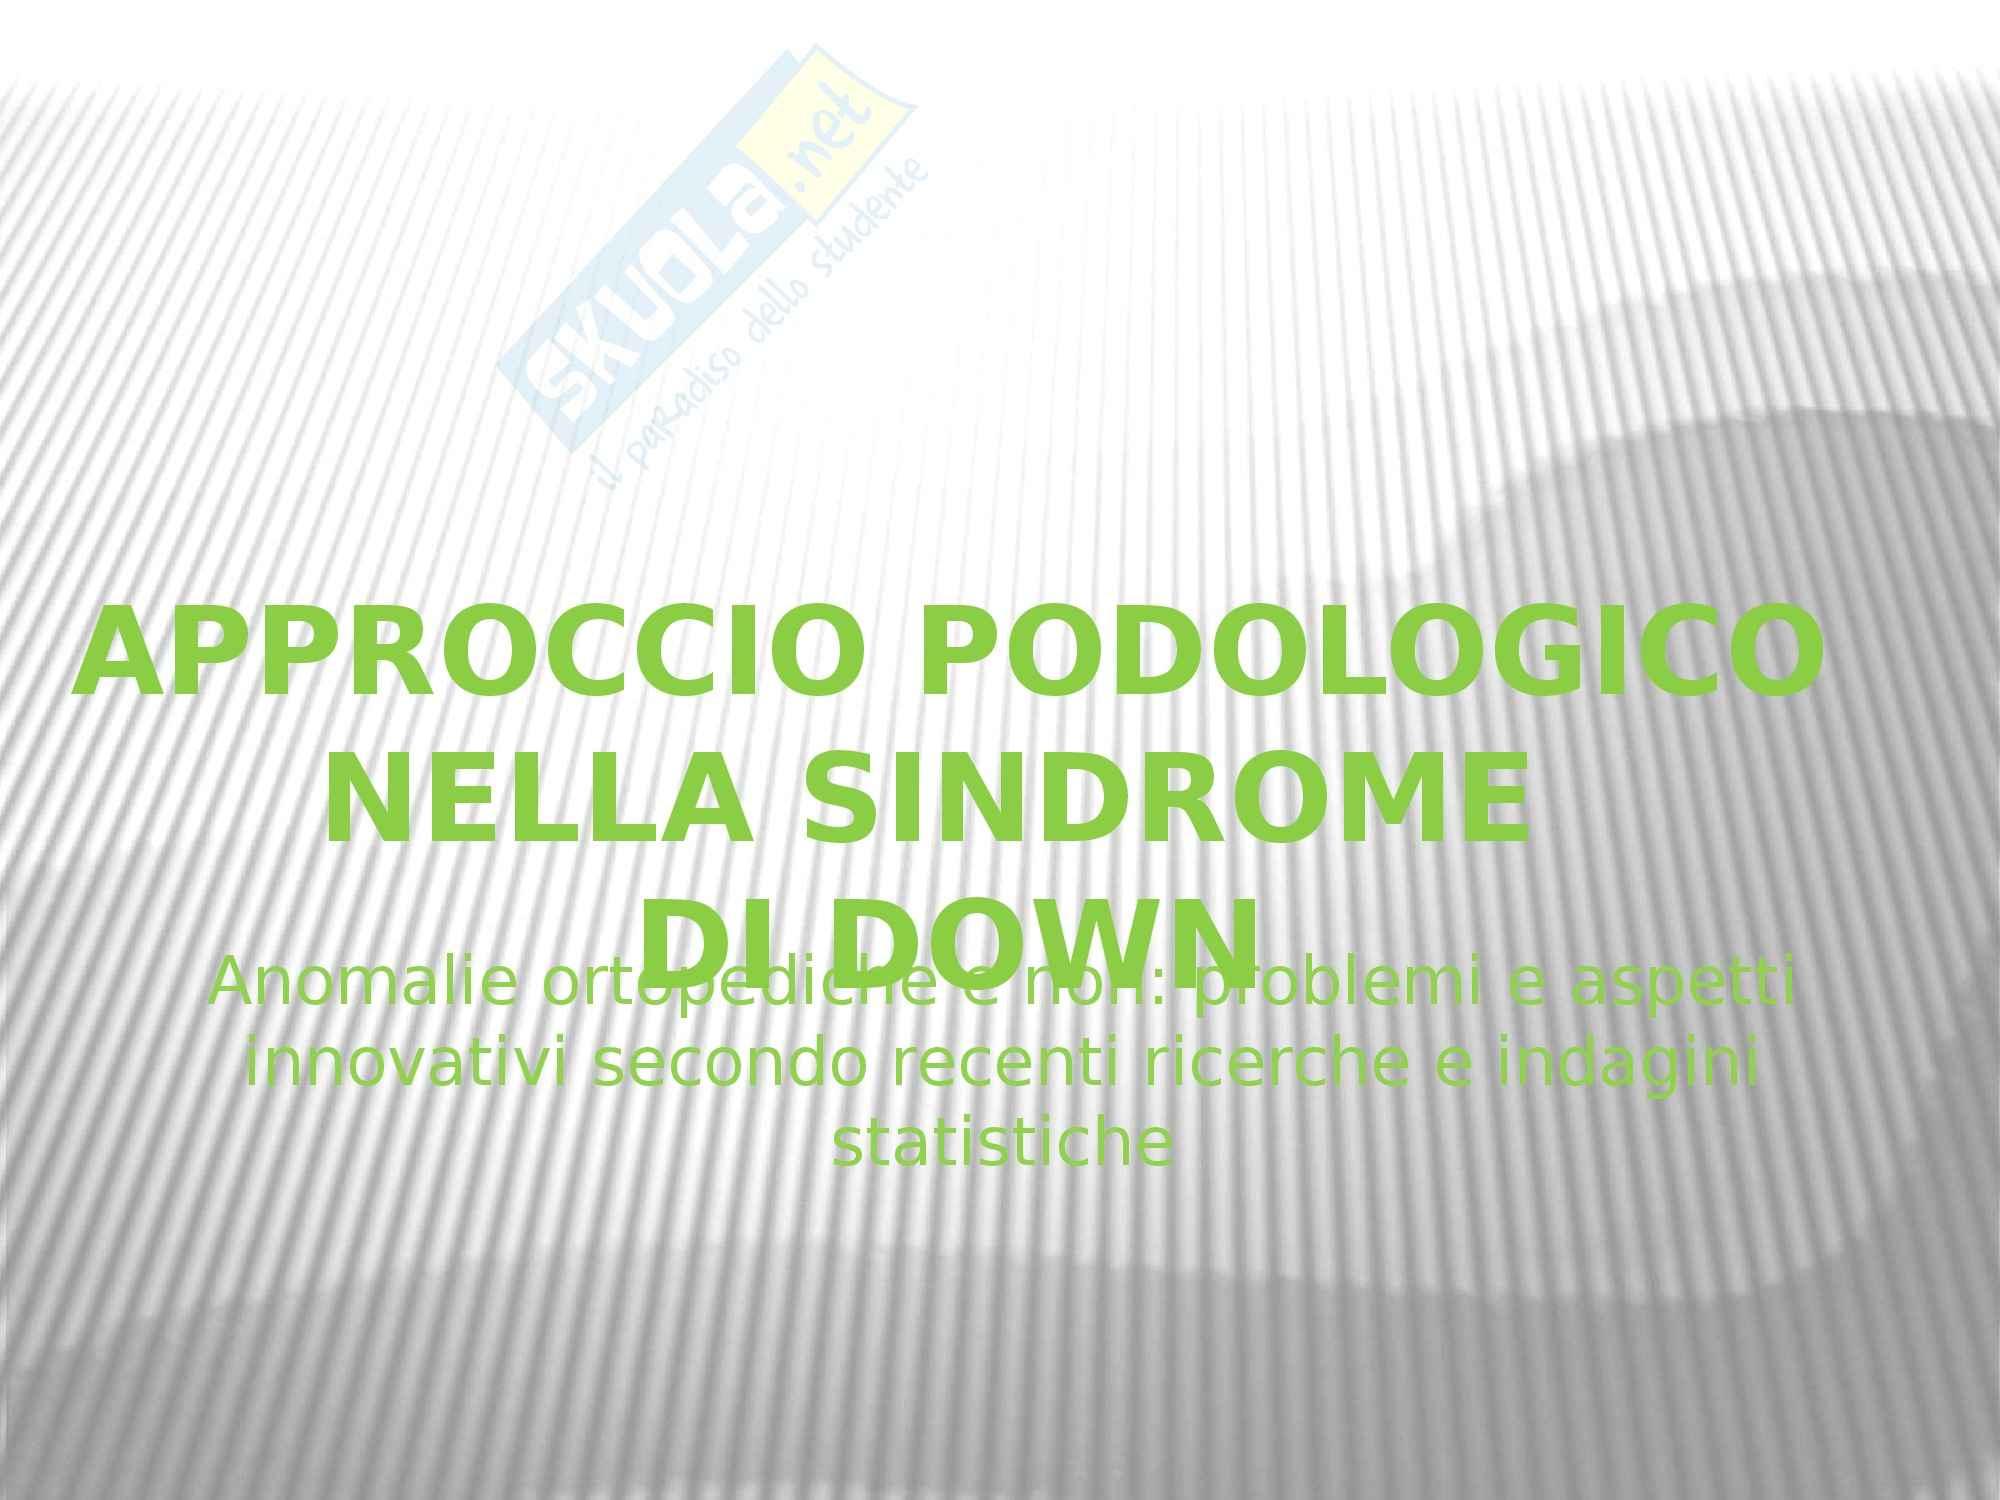 appunto R. Bernaberi Podologia